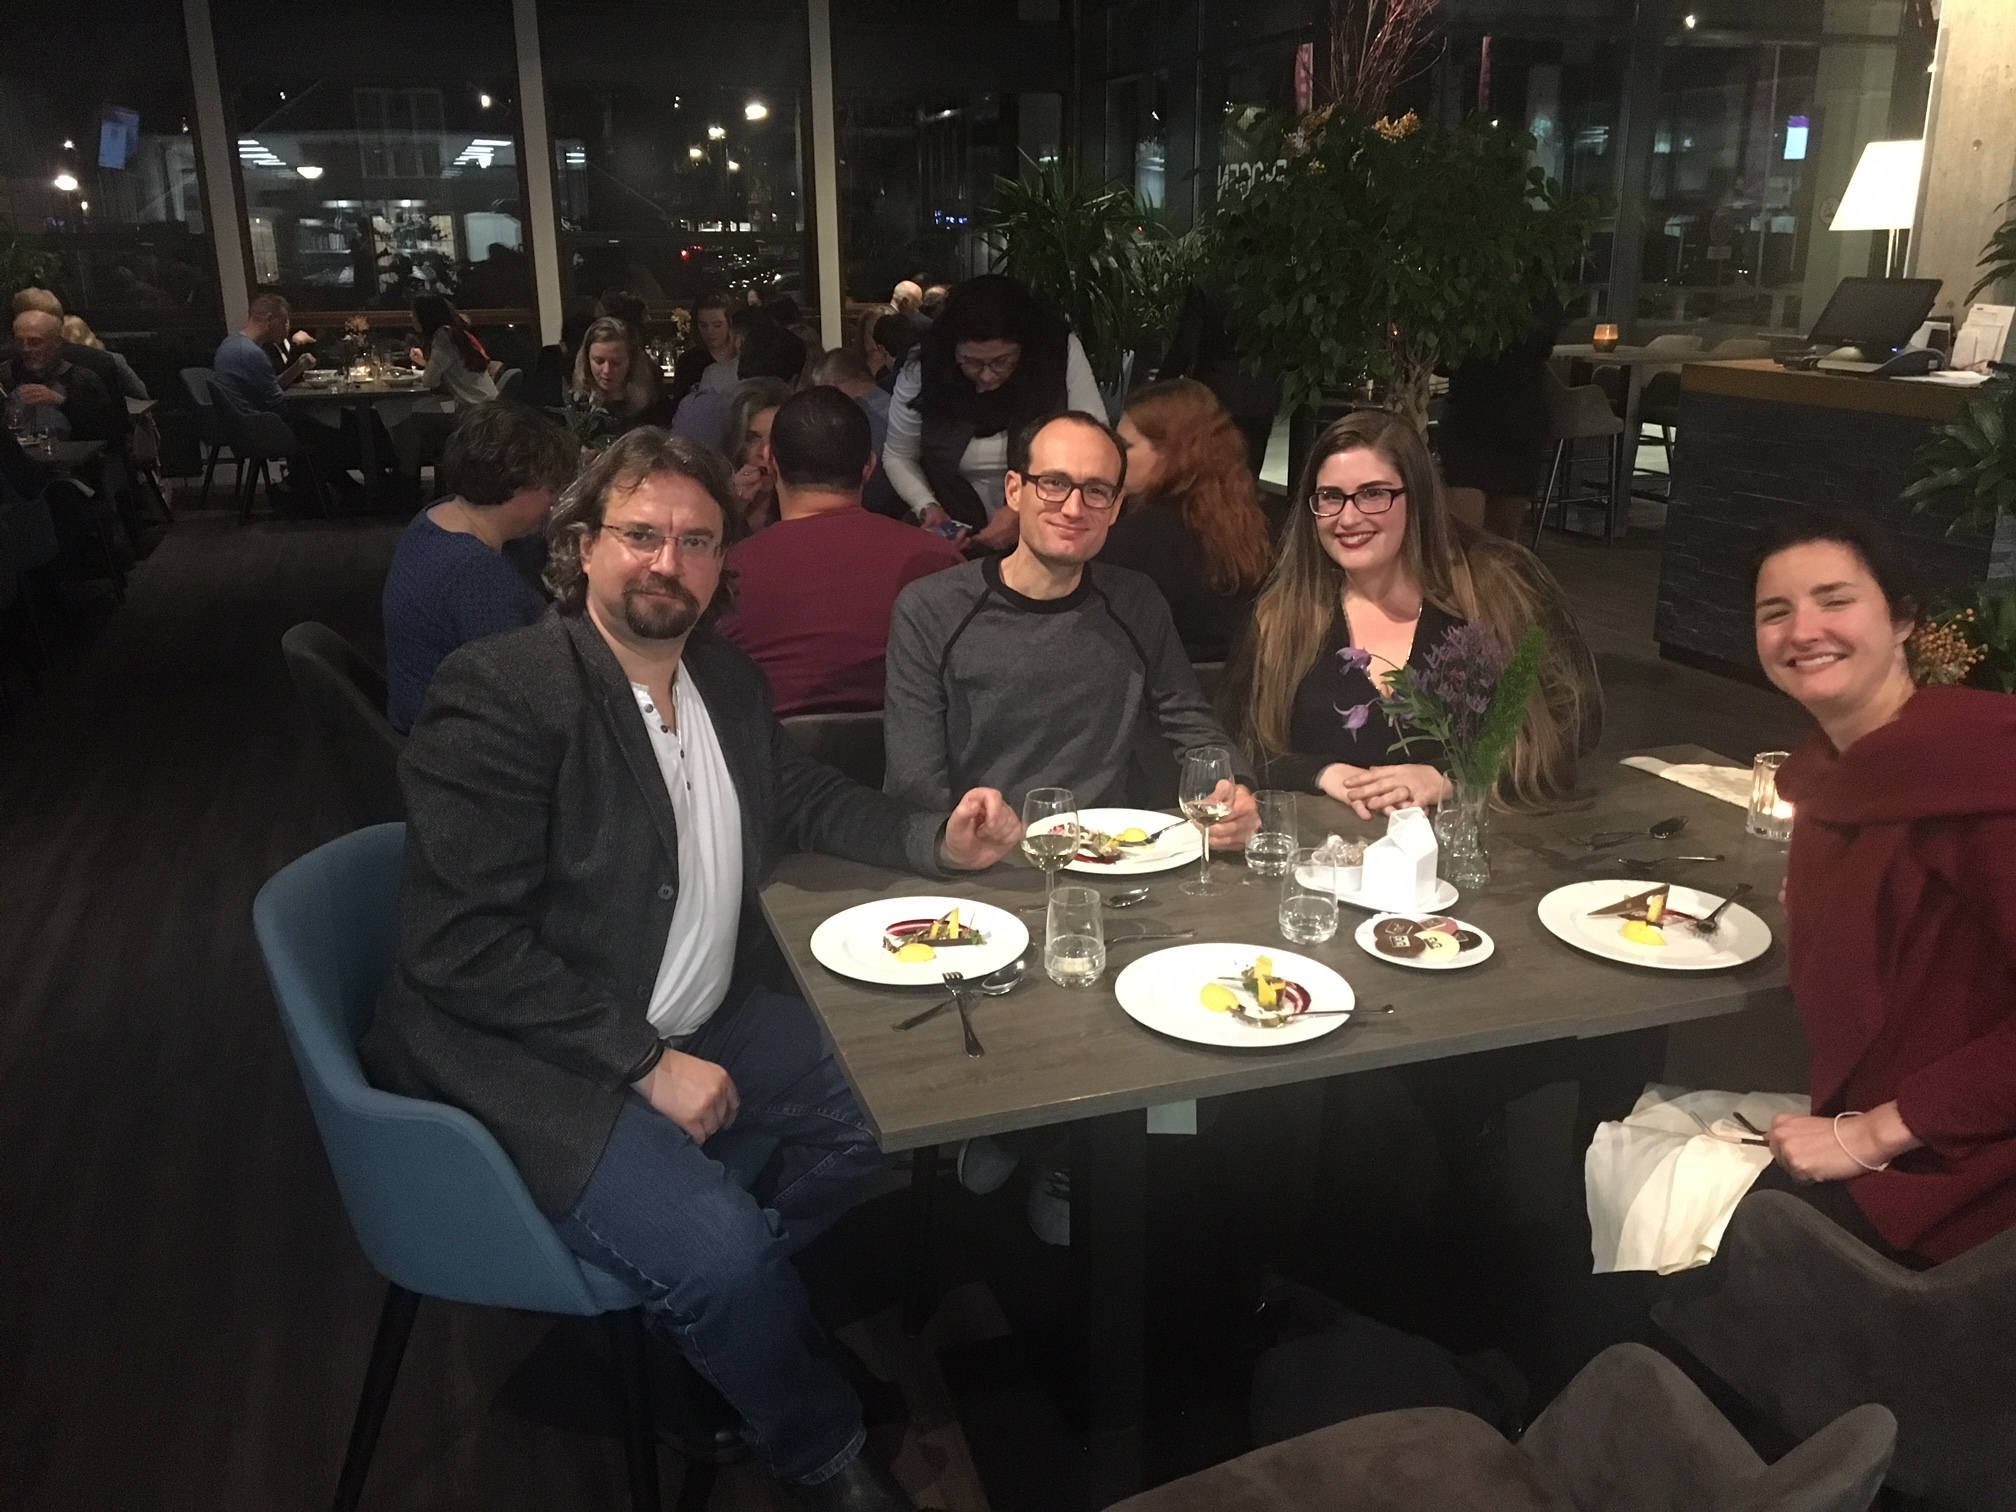 Marcin Murawski, Andy Braddock, Elyse Dalabakis, and Daphne Gerling.